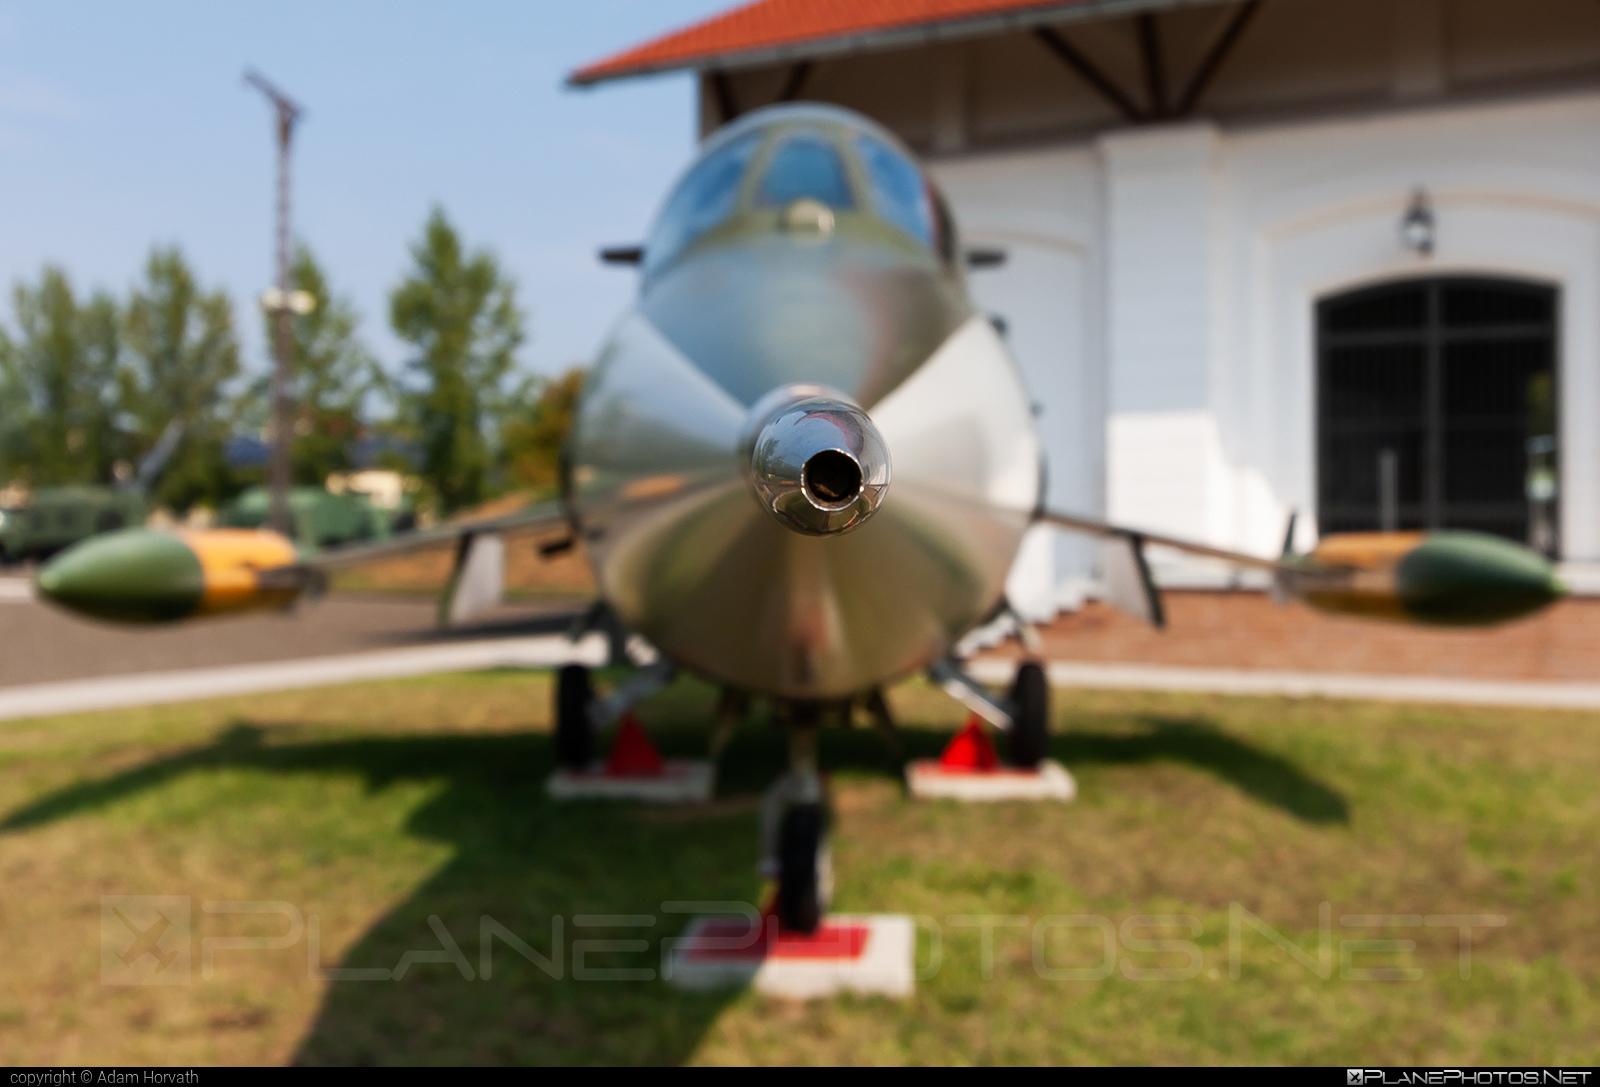 Lockheed F-104G Starfighter - 21+64 operated by Luftwaffe (German Air Force) #f104 #f104g #f104starfighter #lockheed #starfighter